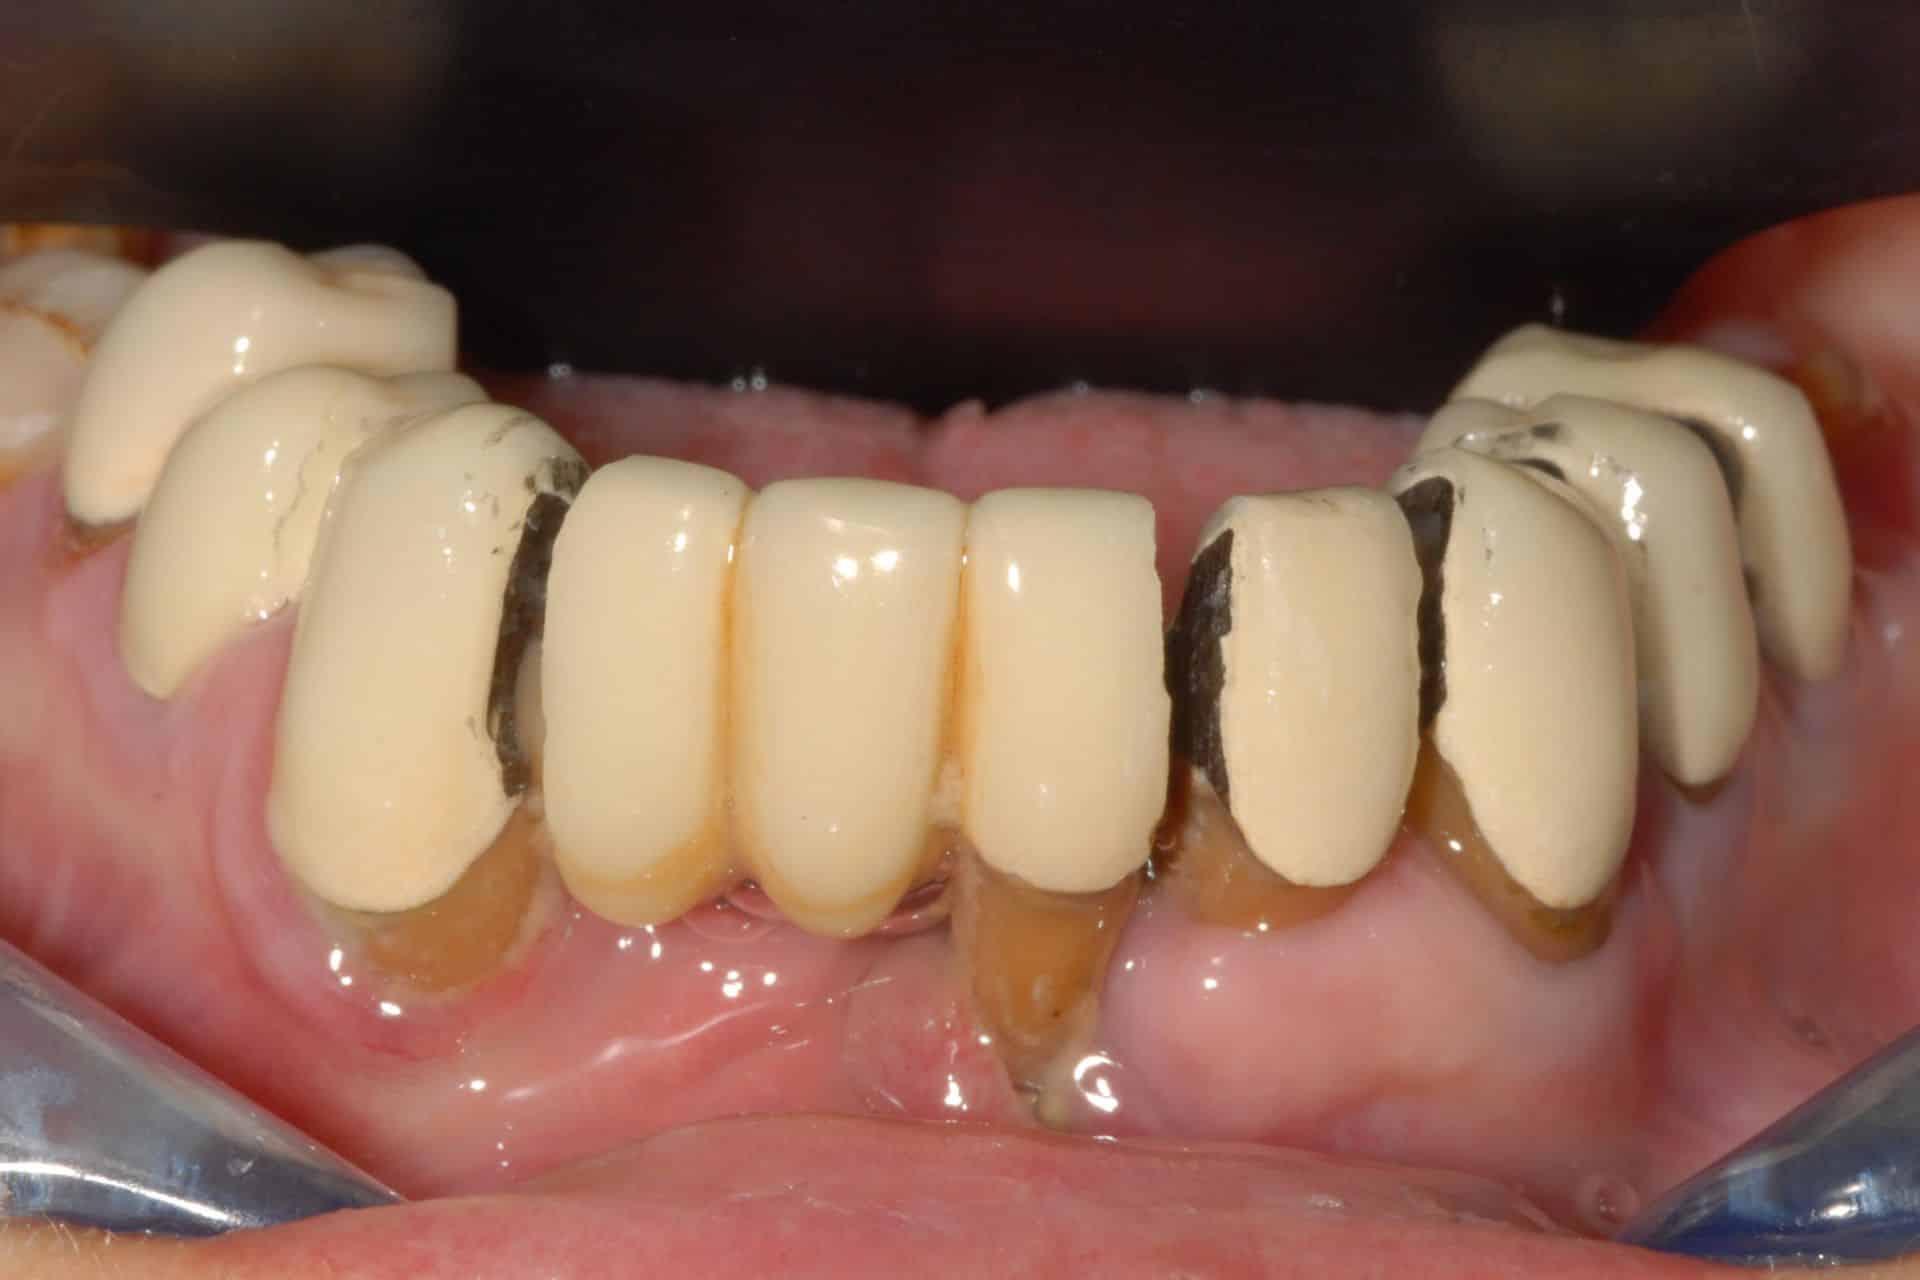 parodontite grave ed impianti dentali